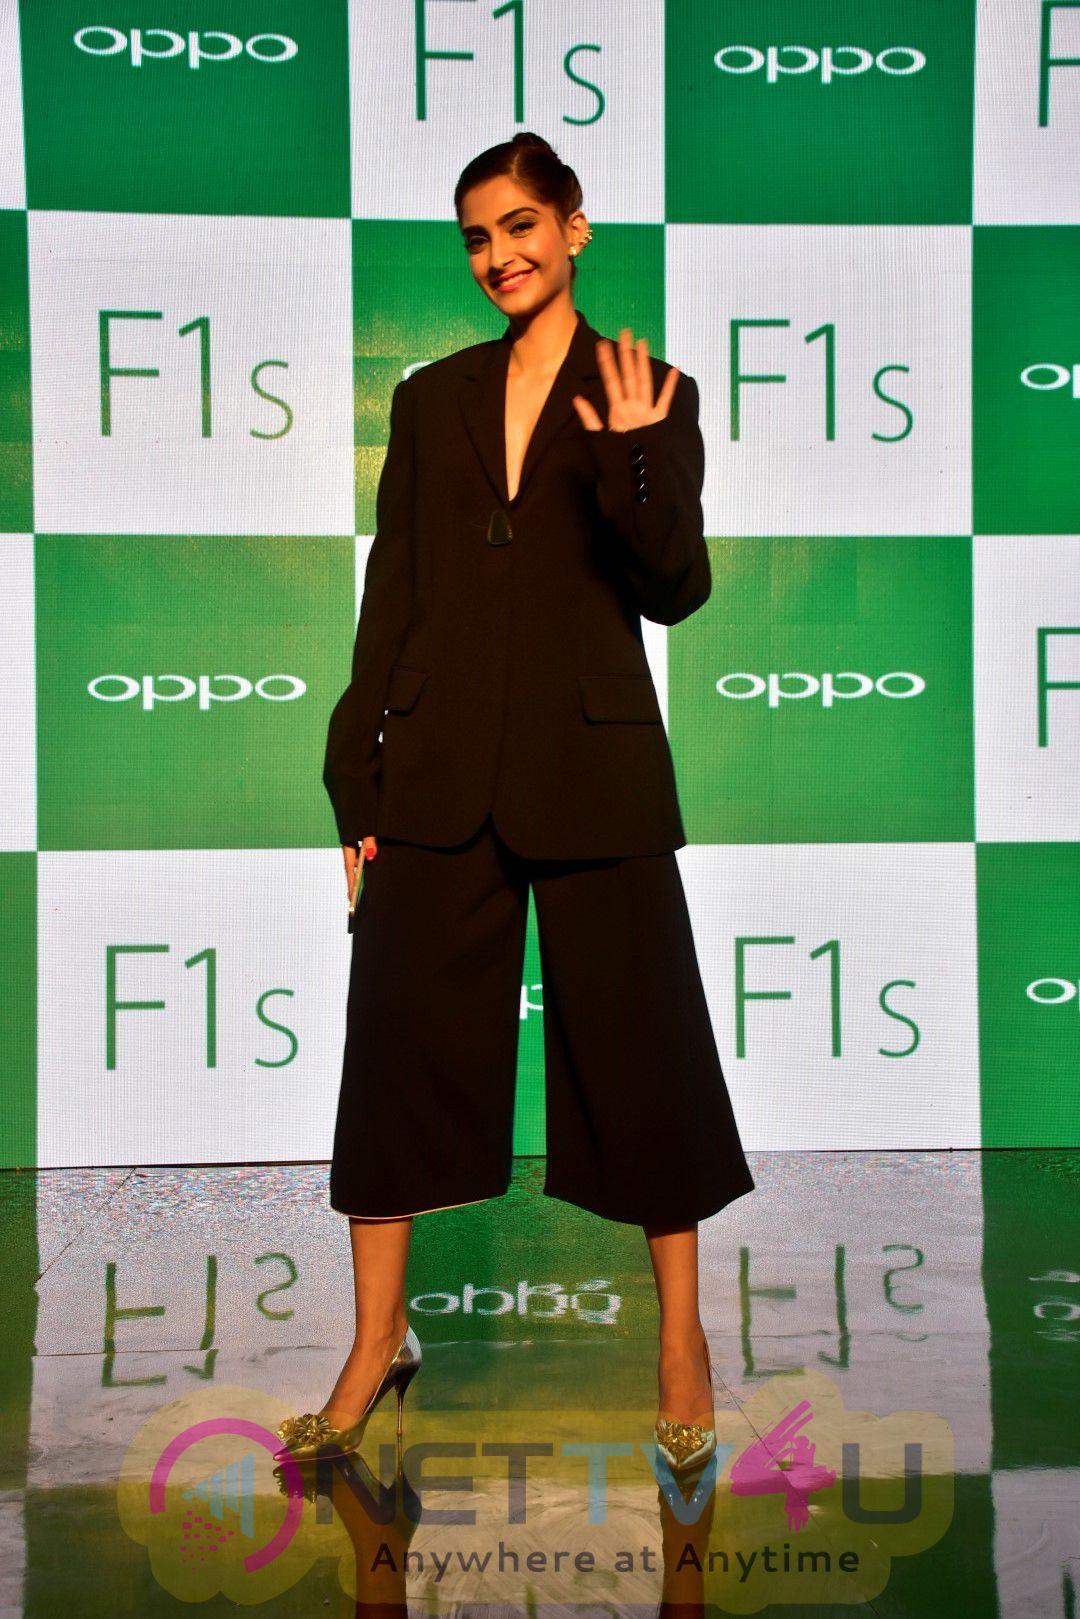 Sonam Kapoor & Yuvraj Singh Launch New Oppo Mobiles Good Looking Photos